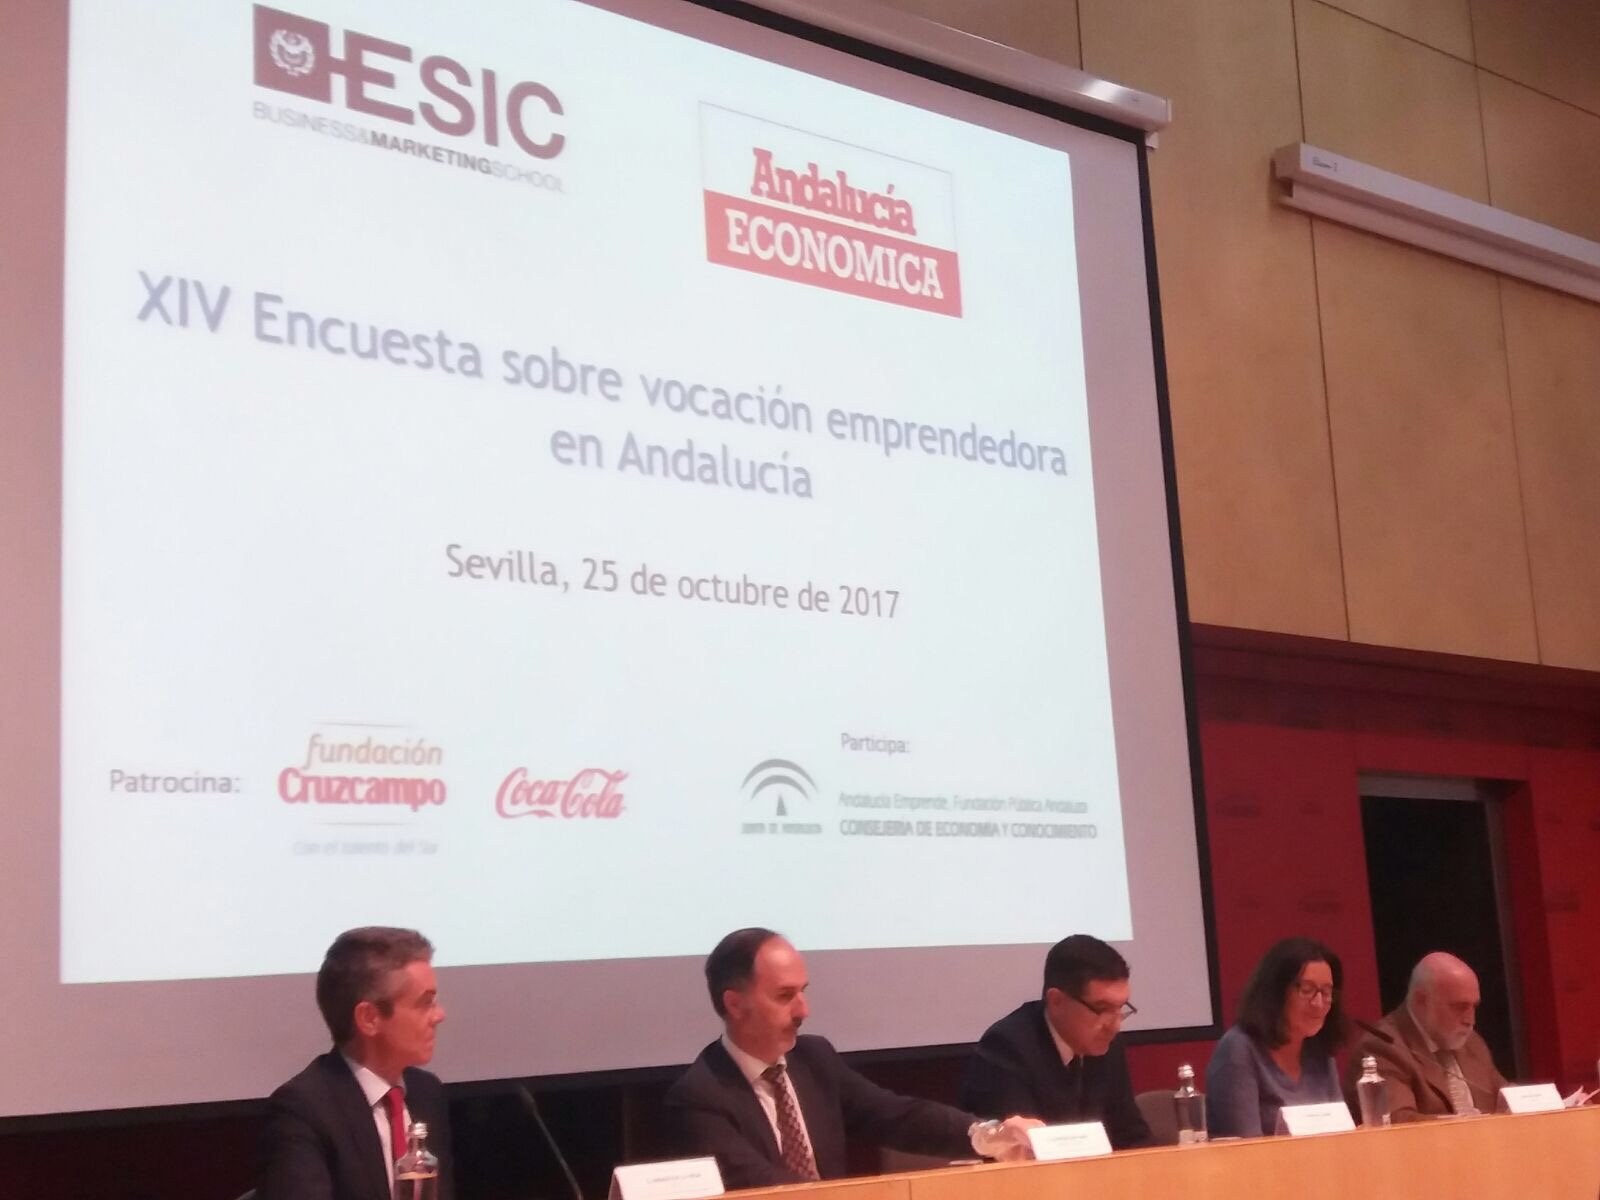 El presidente de Andalucía Emprende destaca que la vocación emprendedora en universitarios andaluces sube cinco puntos